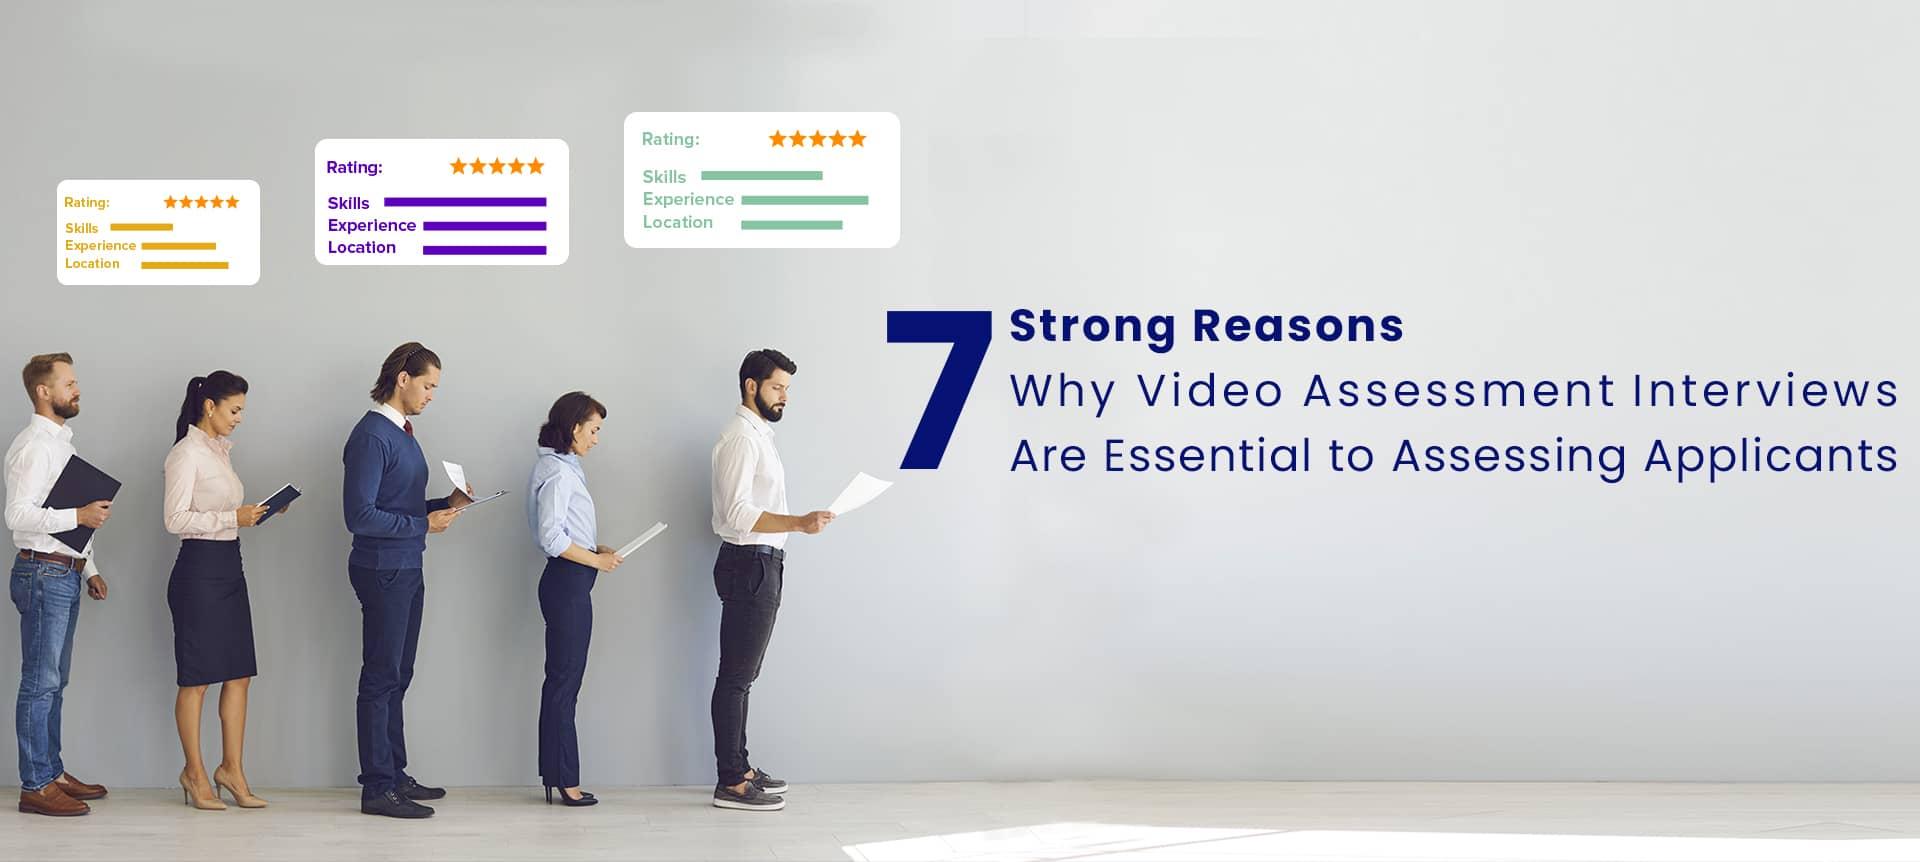 applicants conducting video assessment interviews